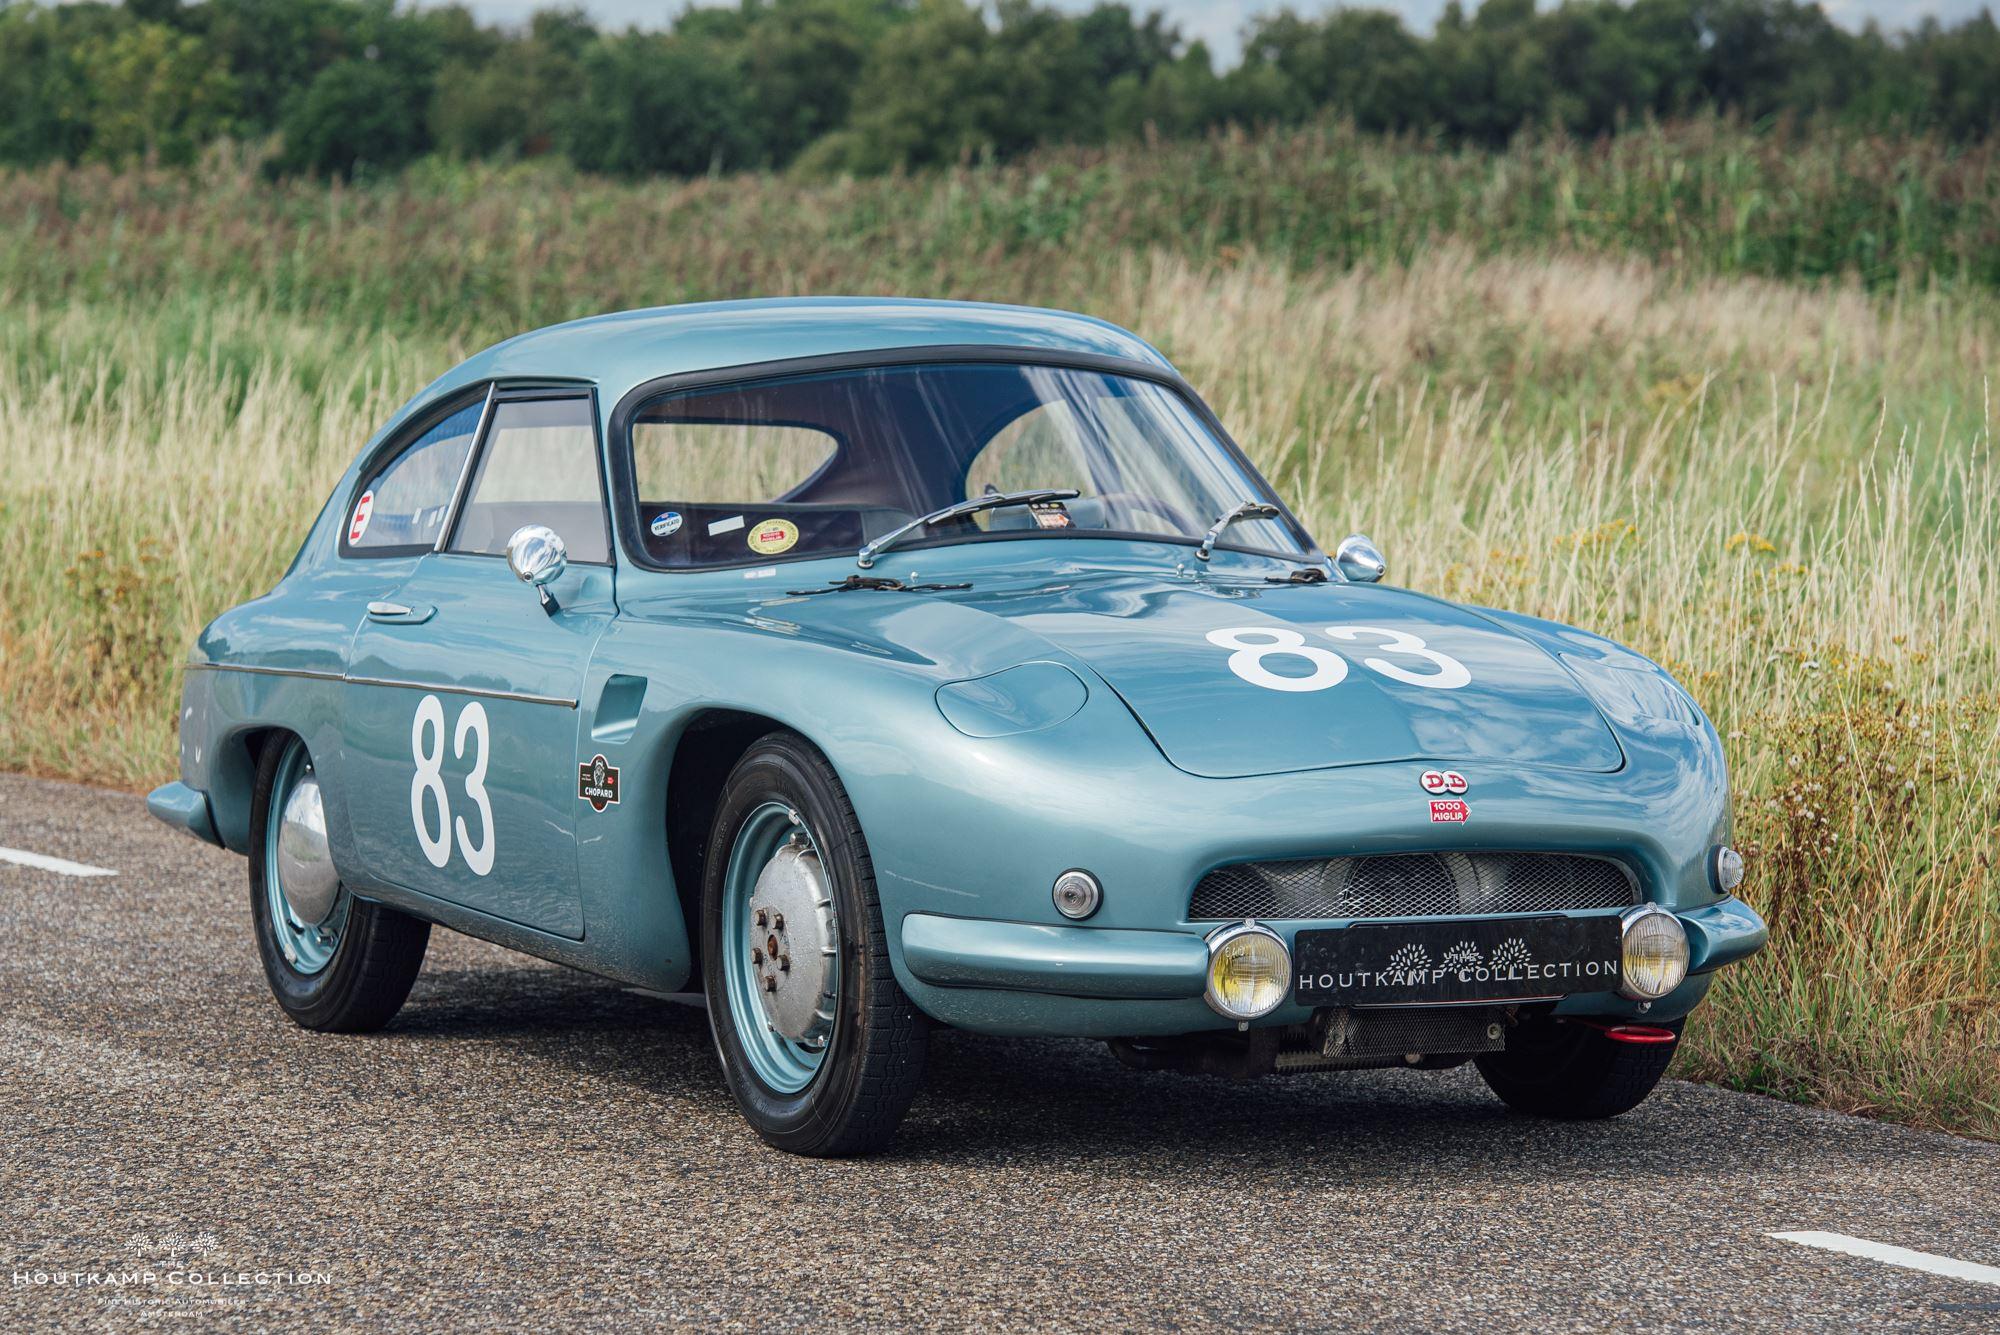 1956-DB-HBR-5-Race-car-Mille-Miglia-1957-(2)